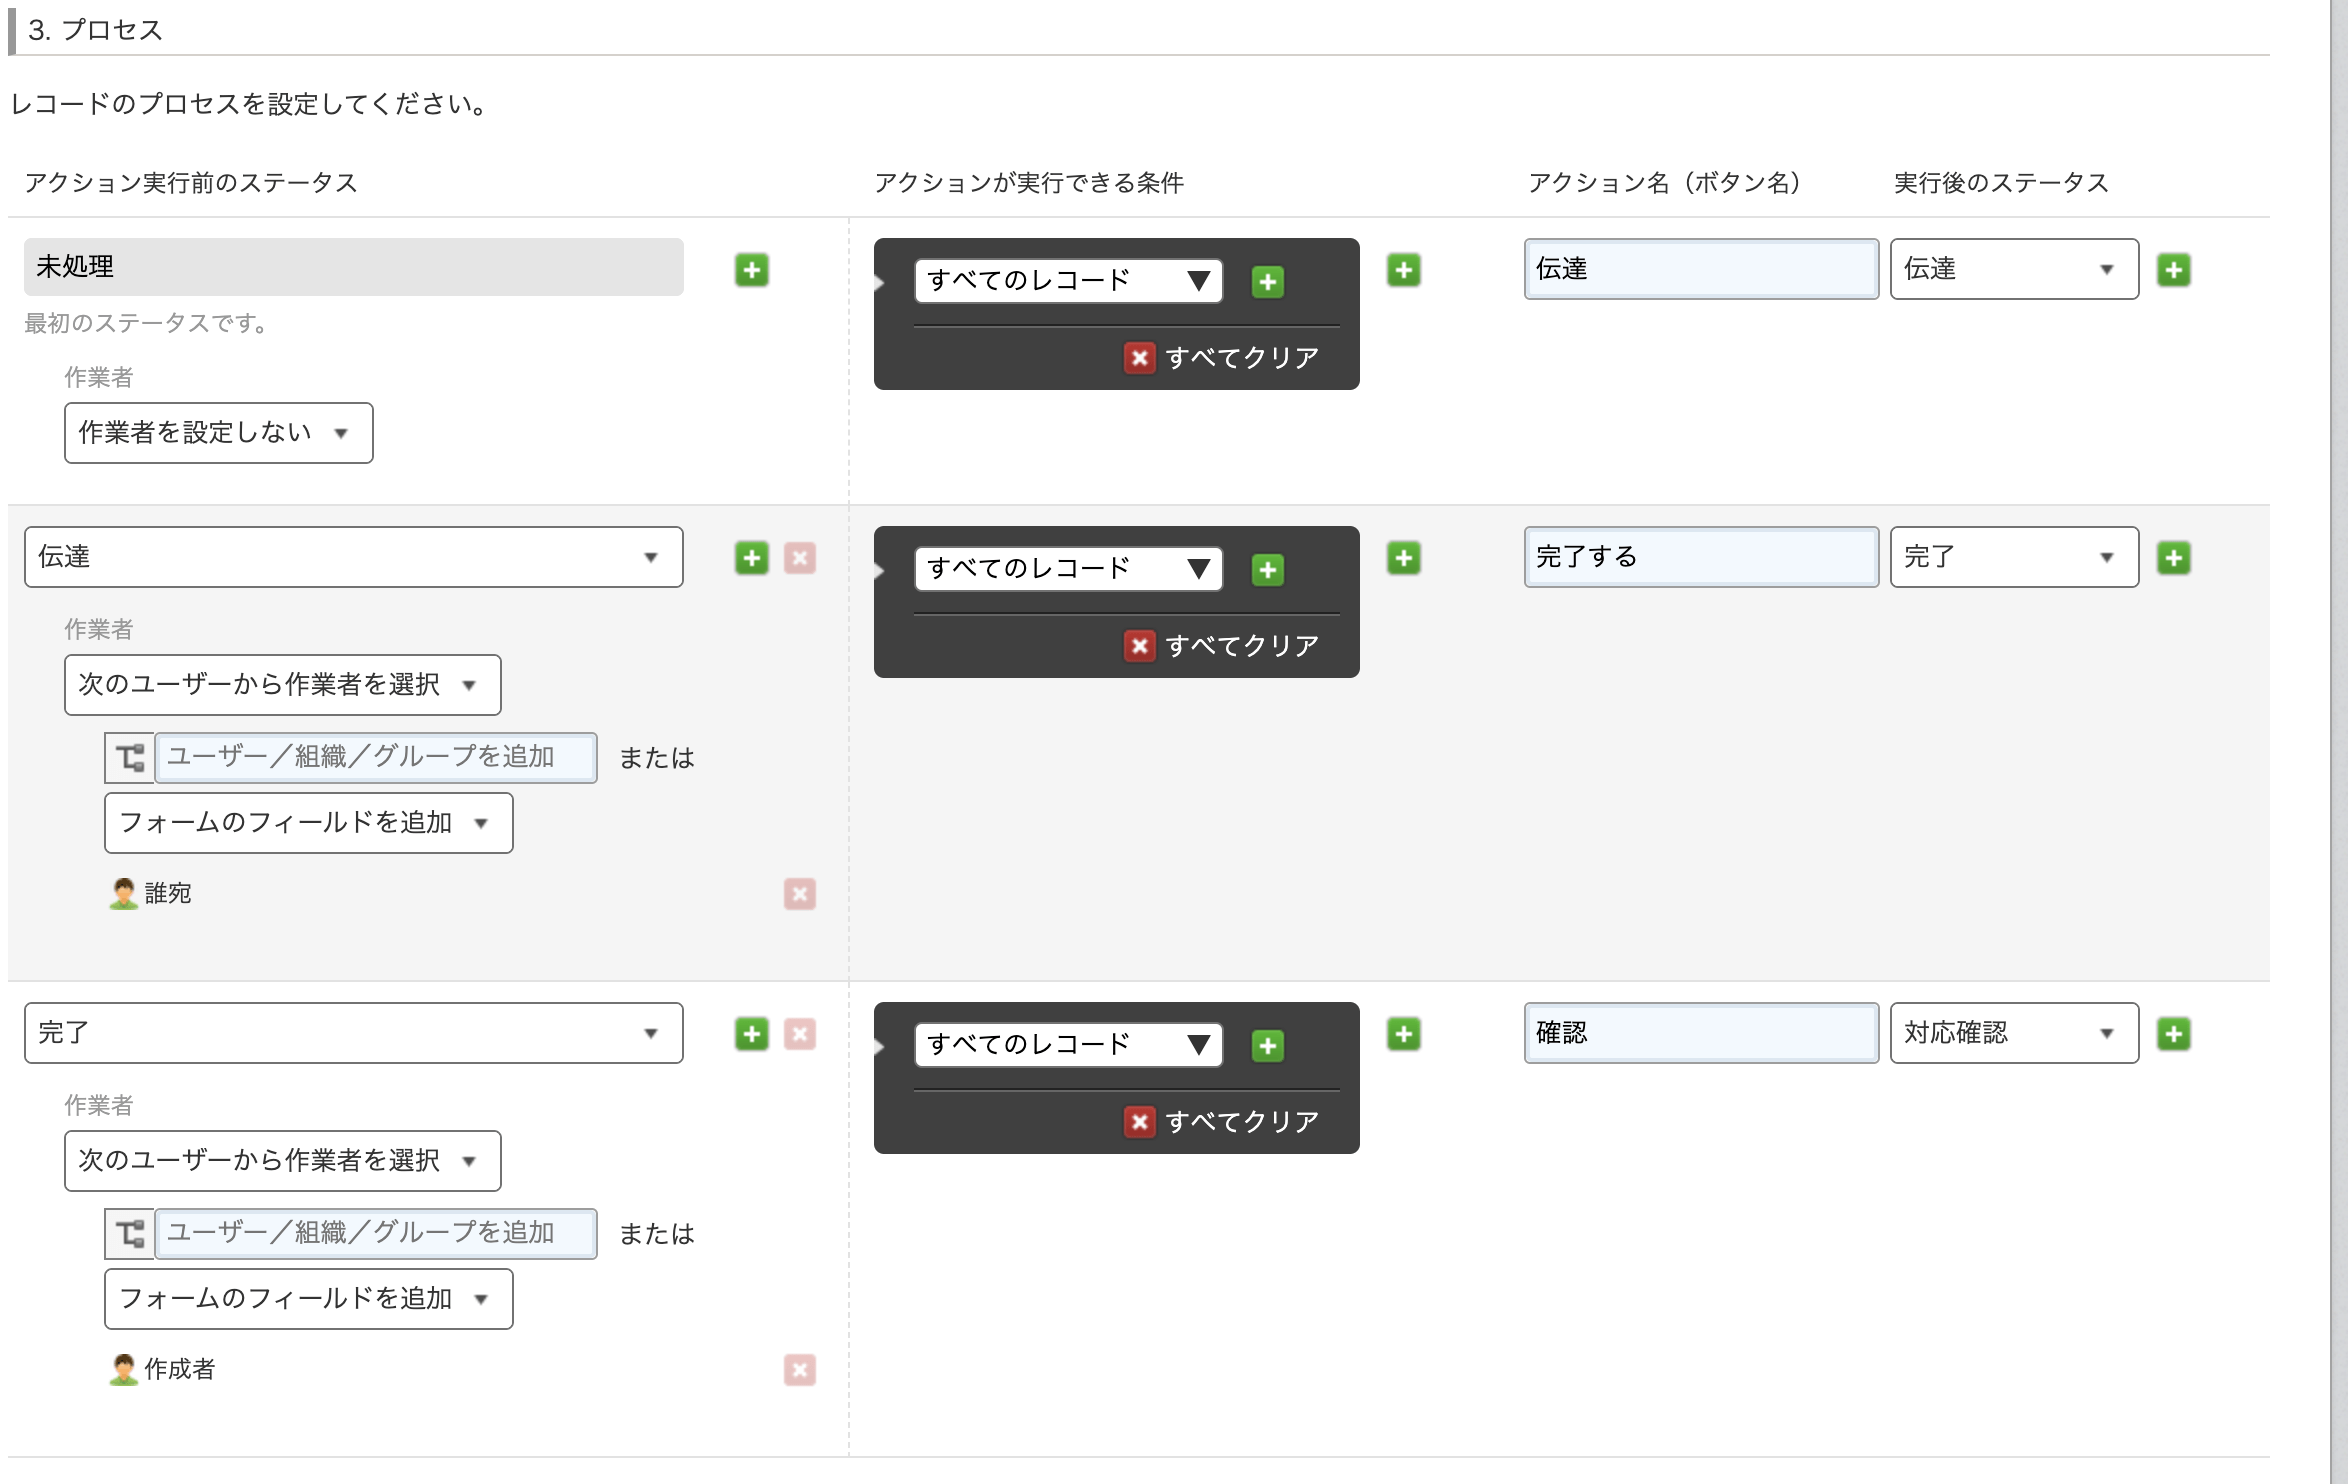 kintoneプロセス管理設定イメージ